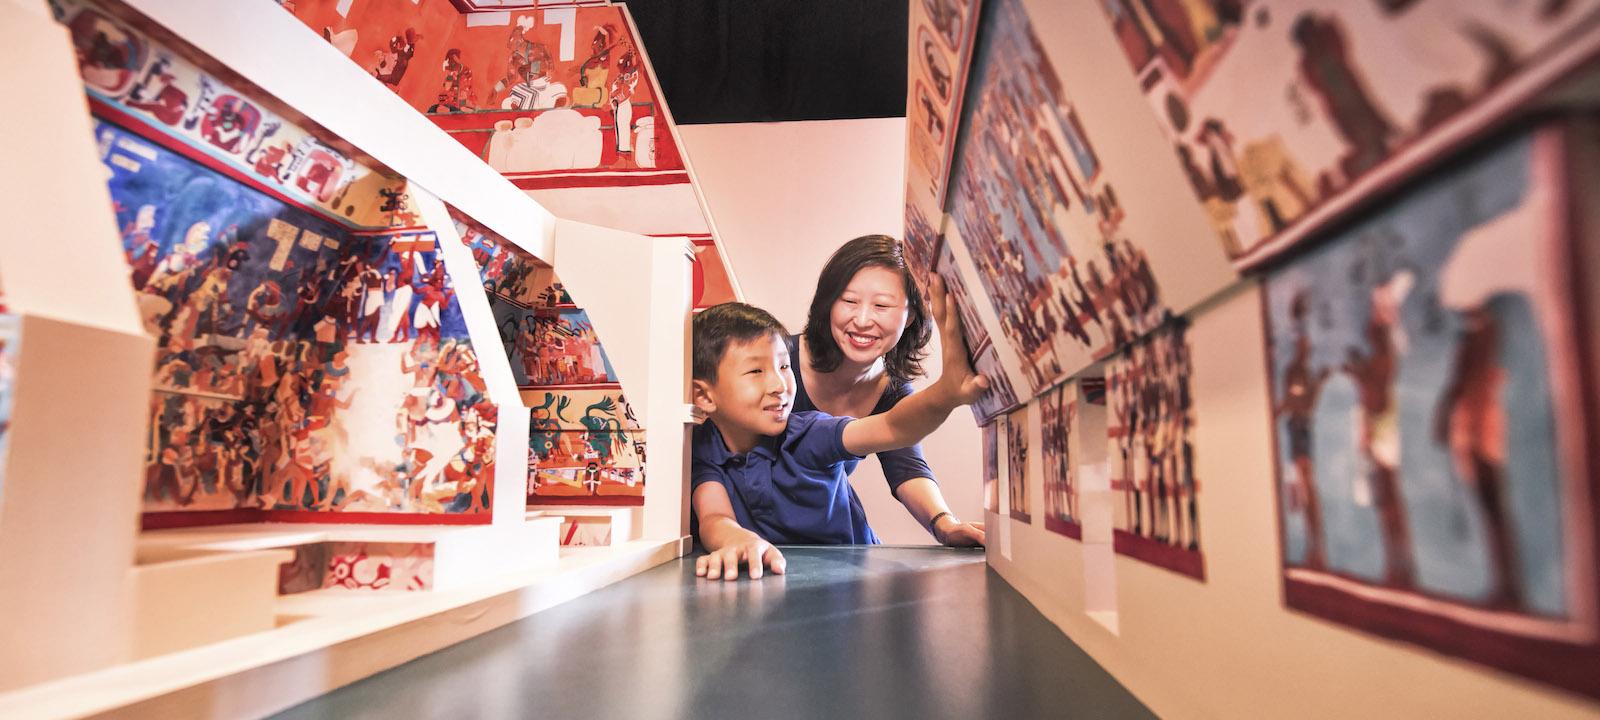 Mother and son exploring the bonampak mural room